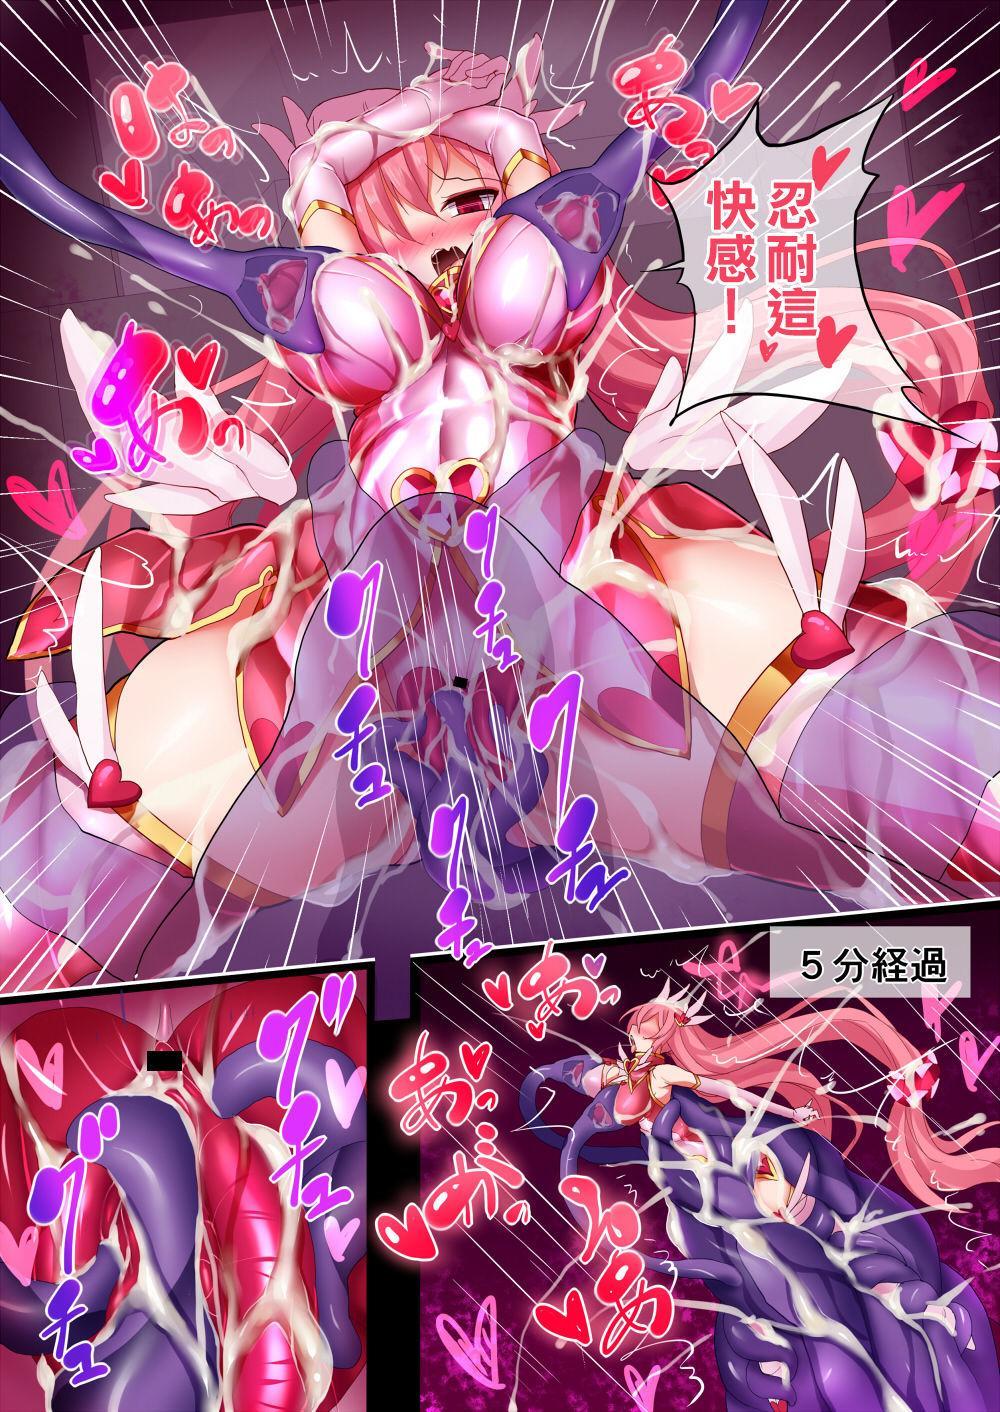 [Makutsutei (Nagai Wataru)] Orgasm Unit EX -Mahou Senshi Akari Ch. 1-2 [Chinese] [这很恶堕 x Lolipoi汉化组] 16